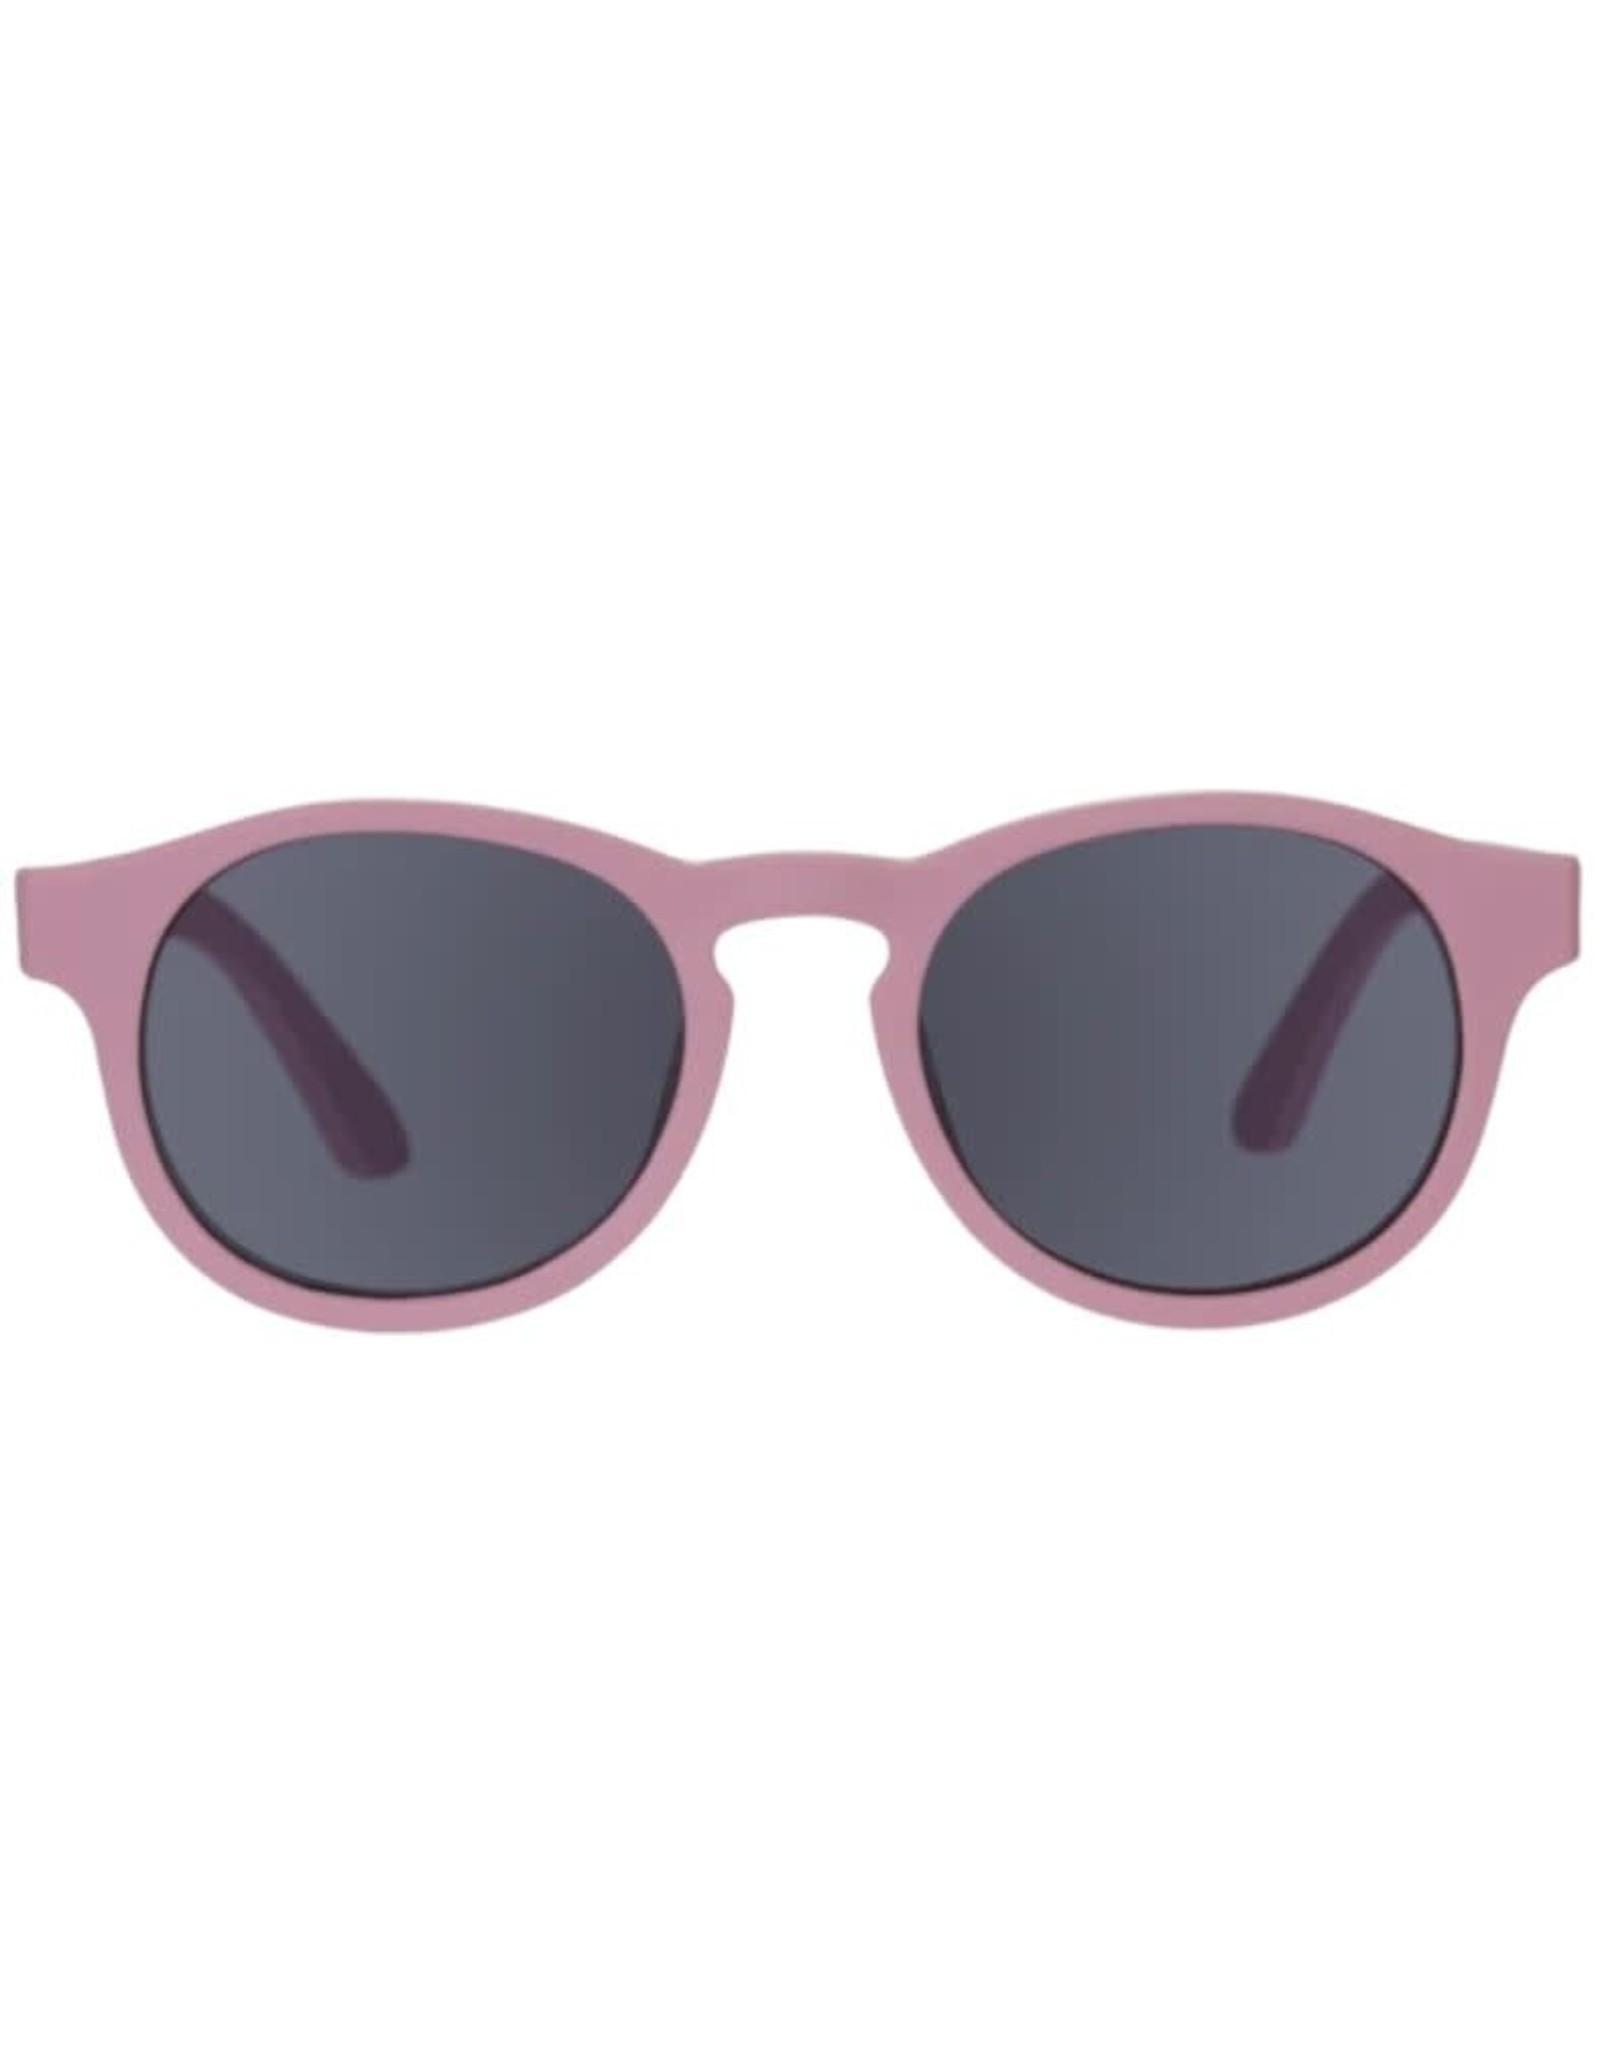 "Babiators ""Pretty in Pink"" Keyhole Sunglasses"